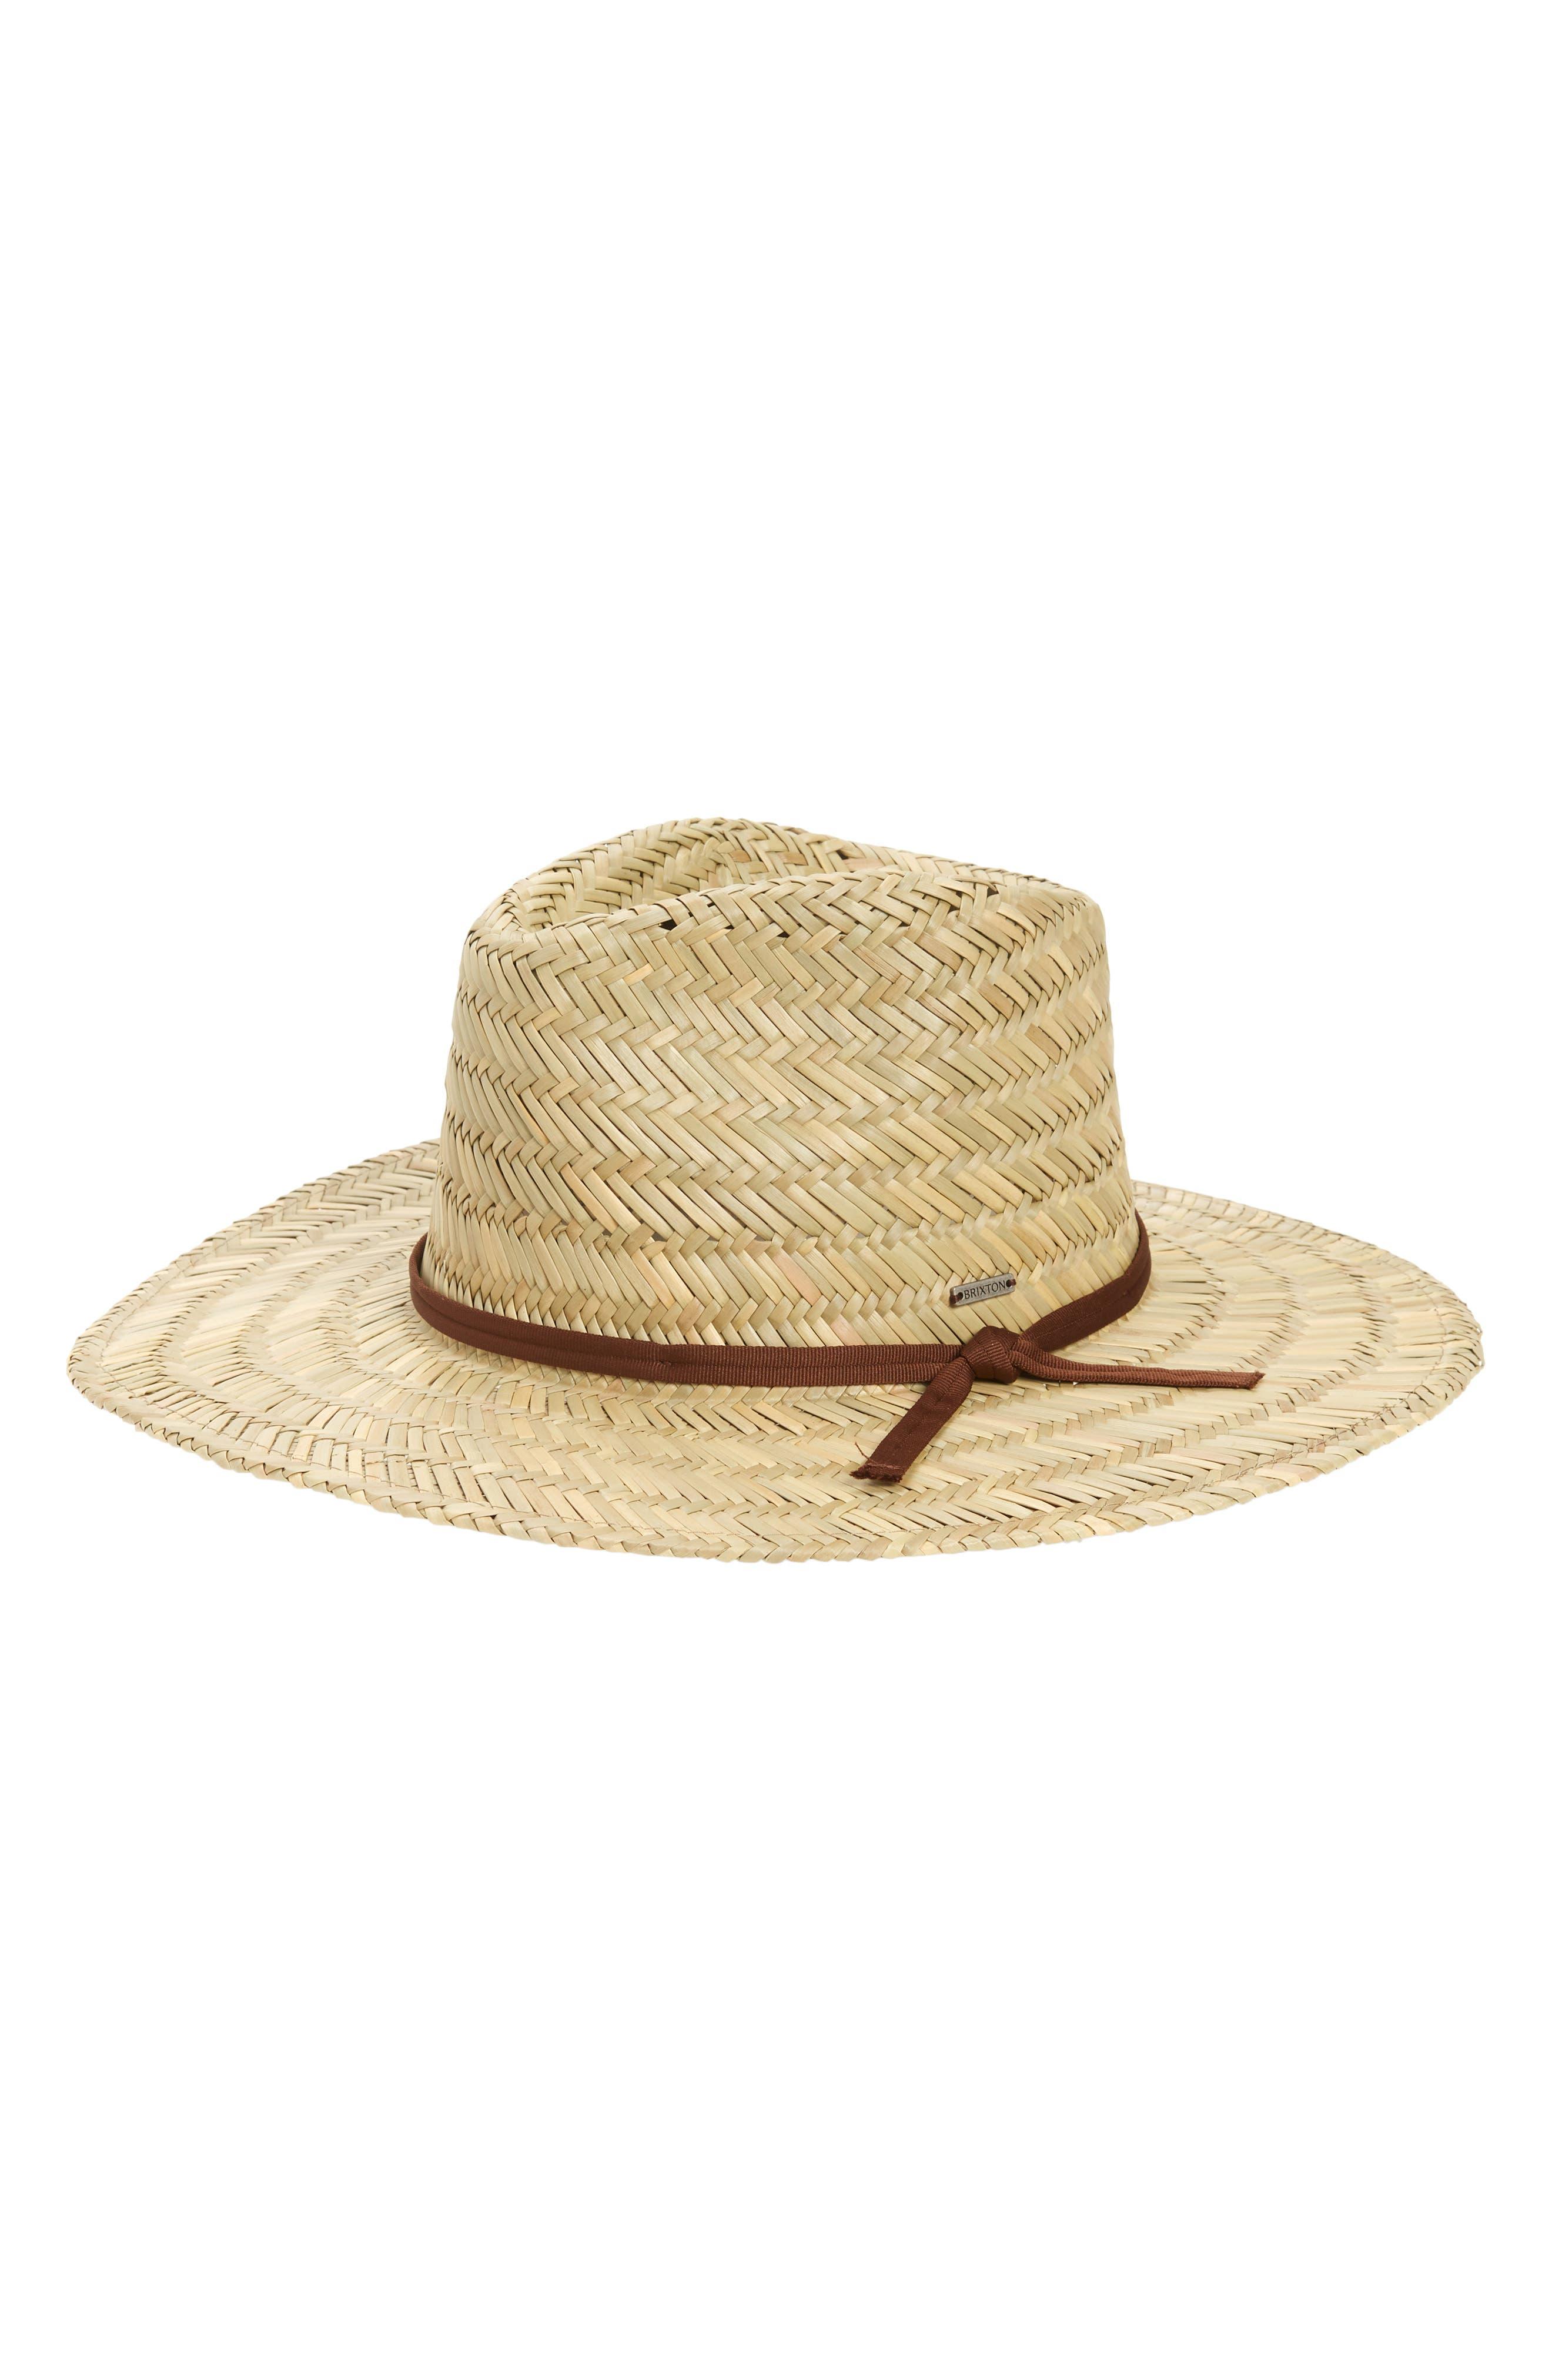 Cohen Straw Cowboy Hat